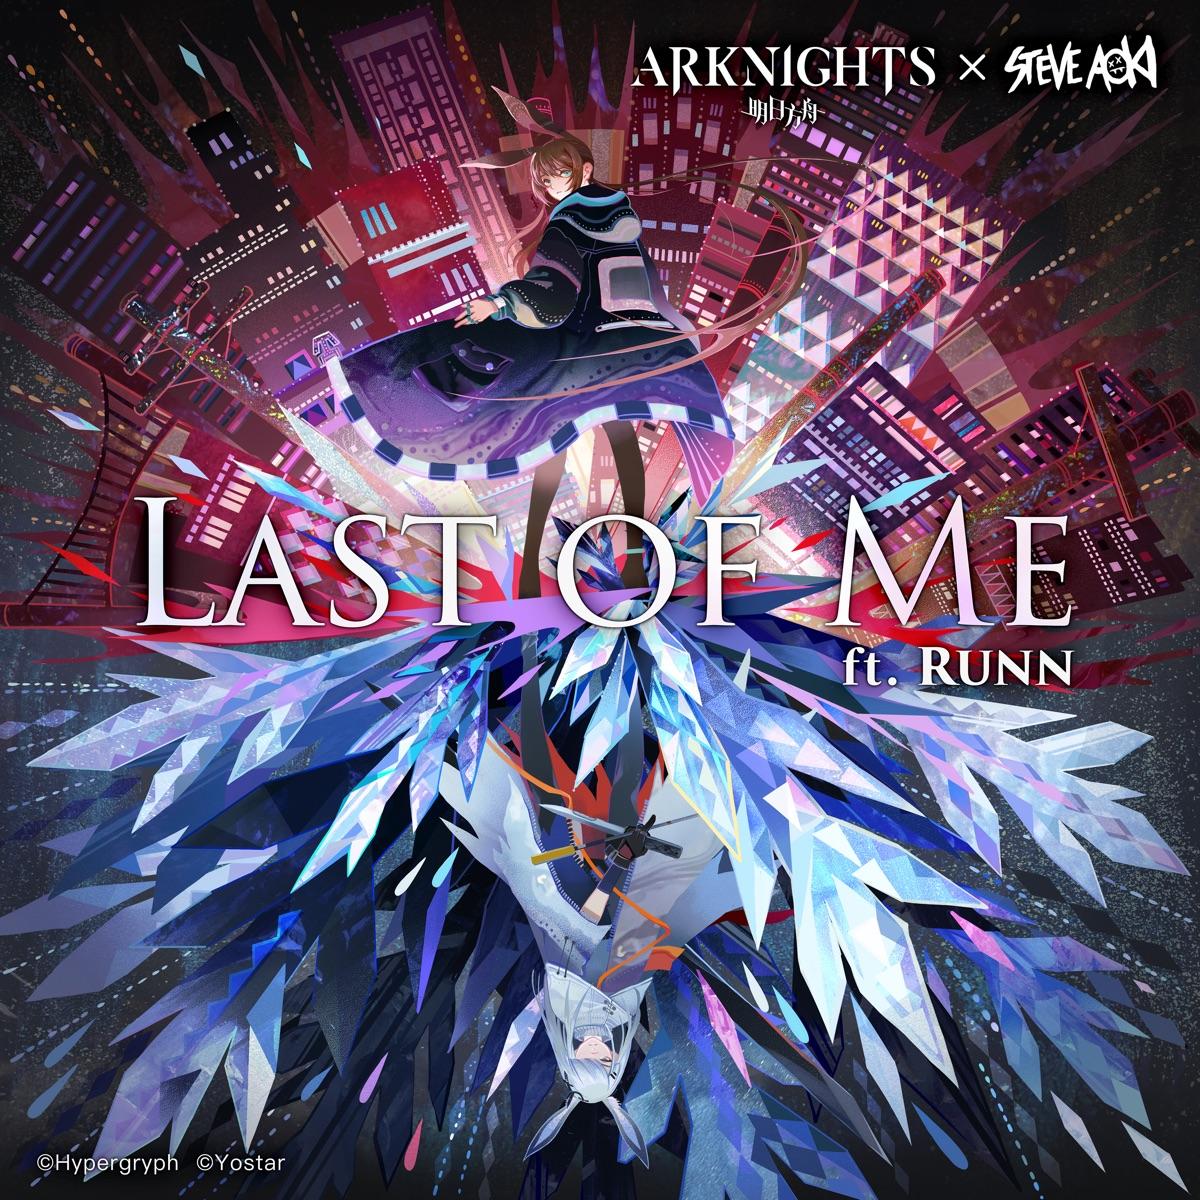 『Steve Aoki - Last of Me feat. RUNN』収録の『Last of Me feat. RUNN』ジャケット